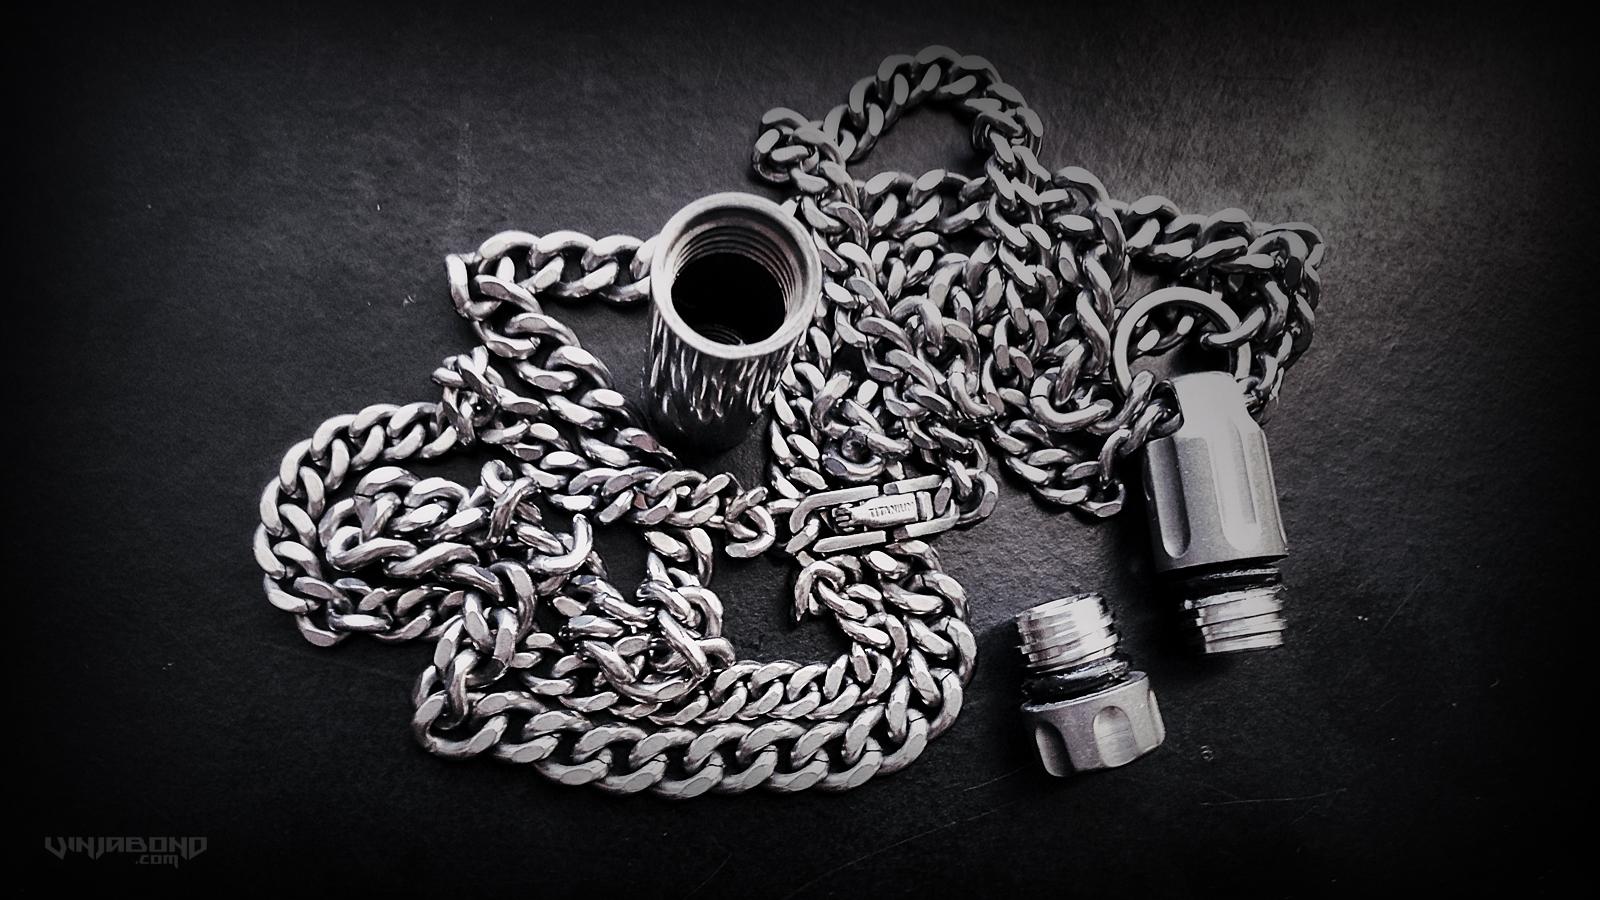 Covert EDC SERE Necklace - VINJABOND